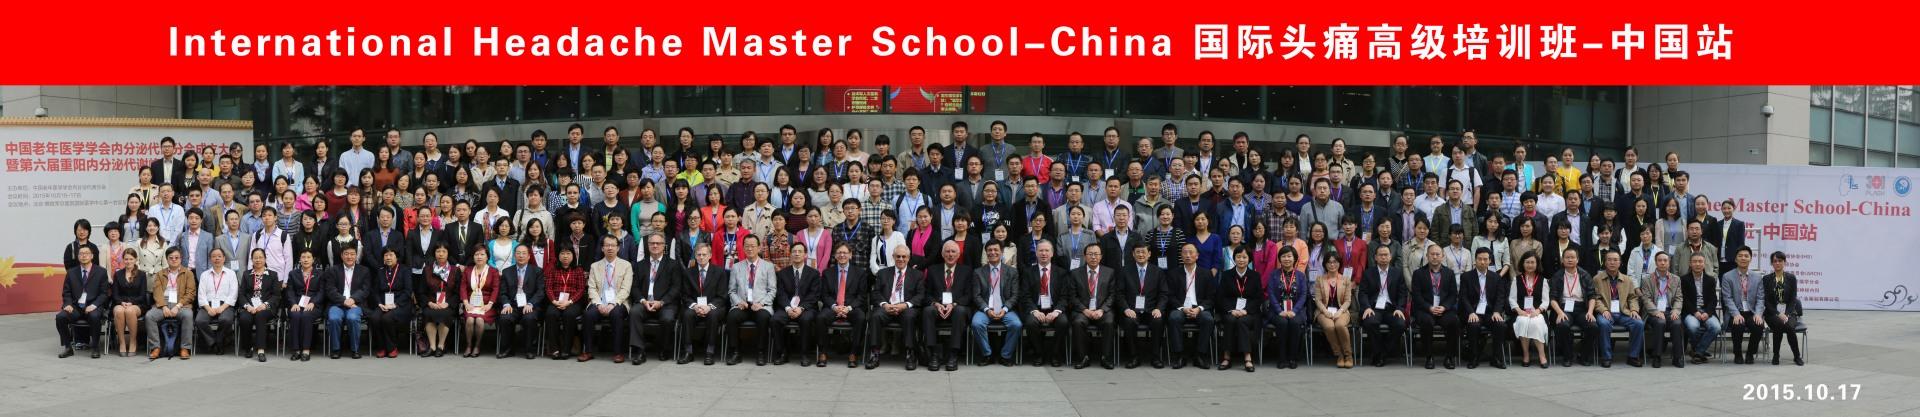 Group Photo- International Headache Master School China